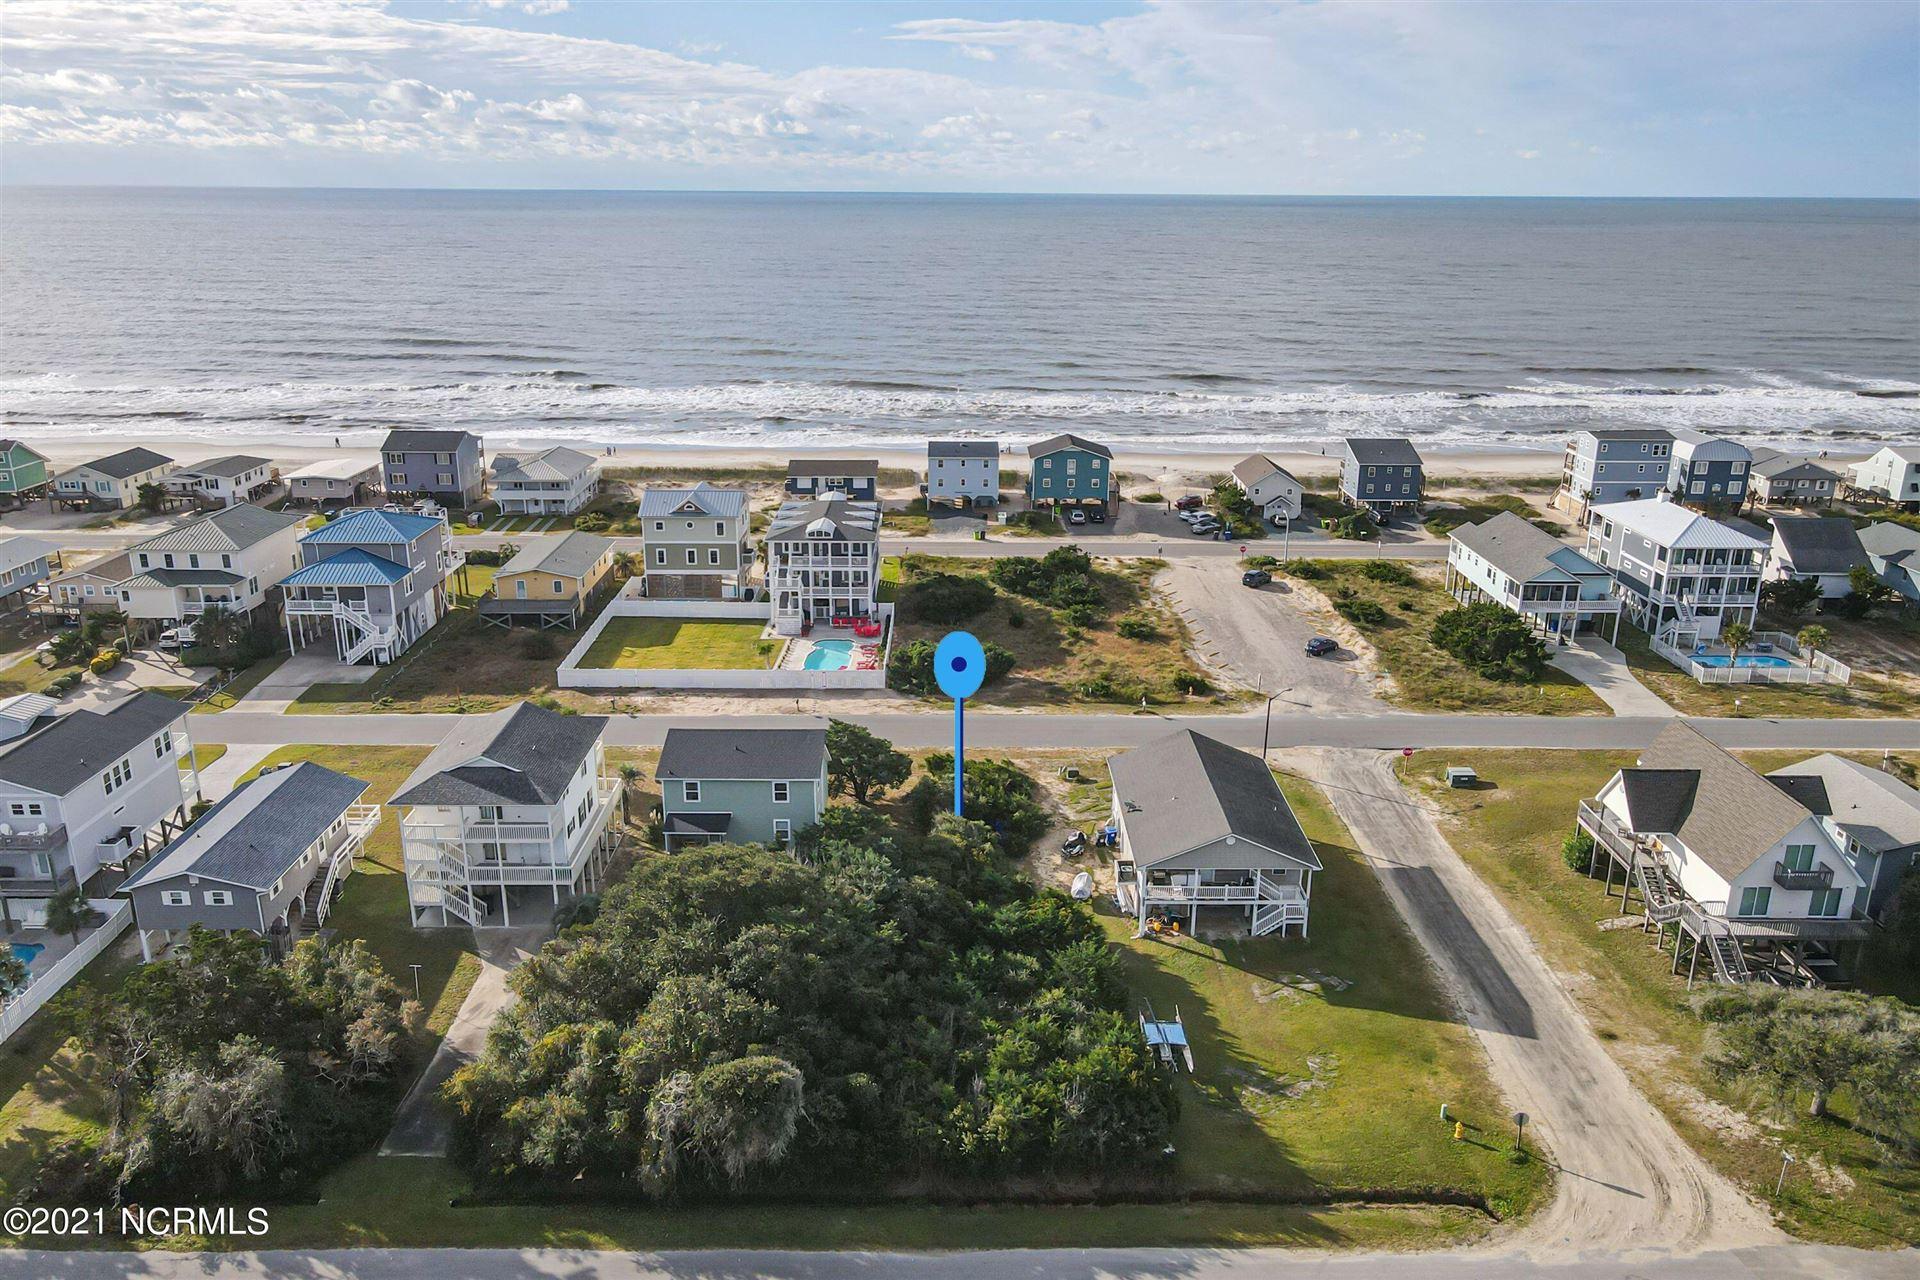 Photo of 128 W Dolphin Drive, Oak Island, NC 28465 (MLS # 100284170)